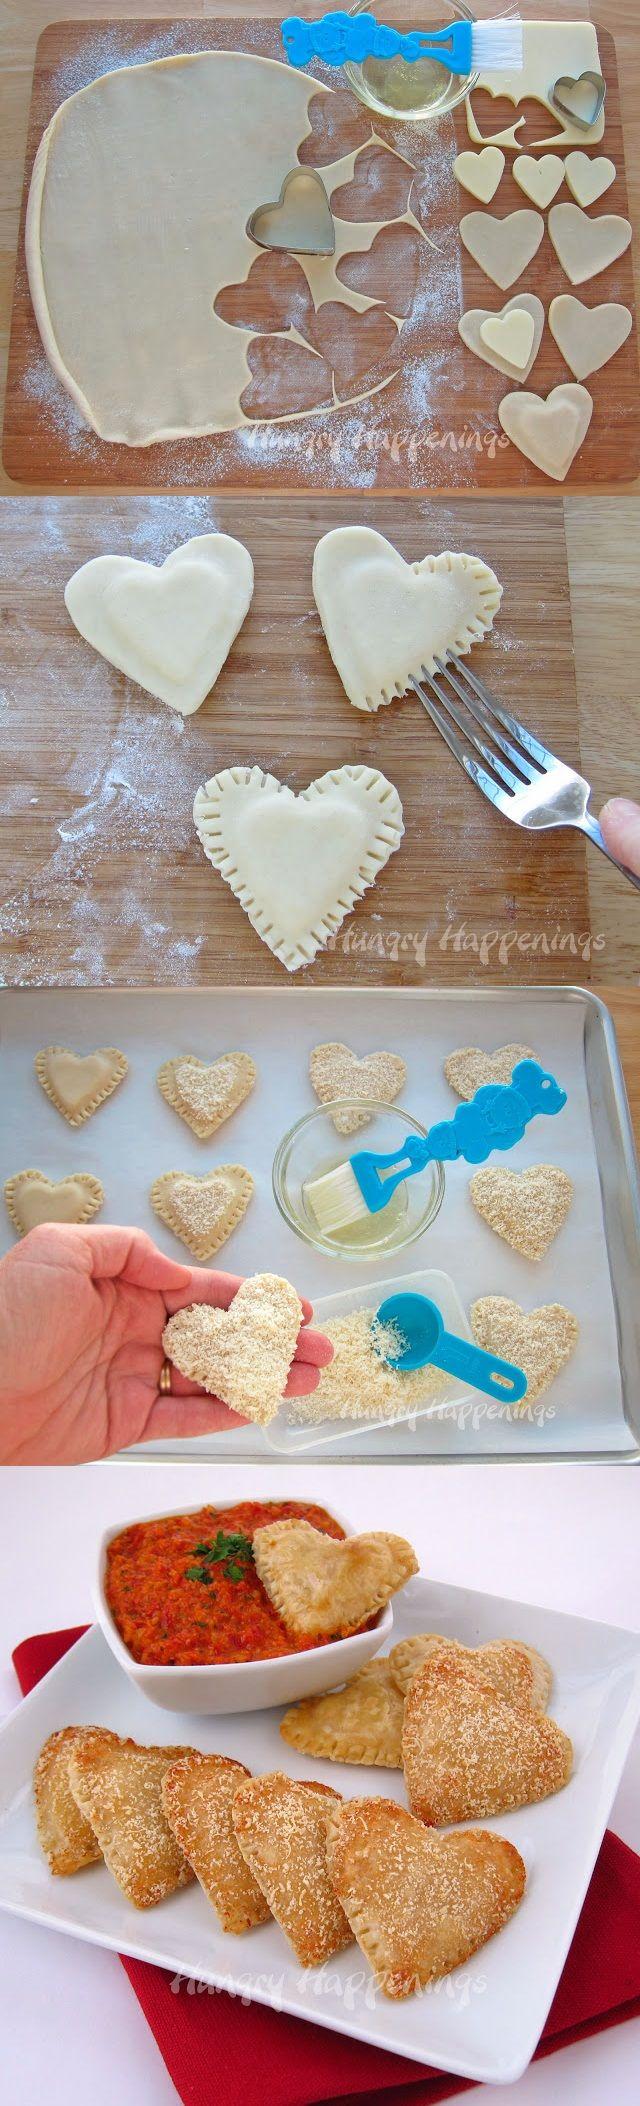 Pillsbury Pie Crust recipe, heart shaped pie, heart shaped food, valentine's day recipes-vert